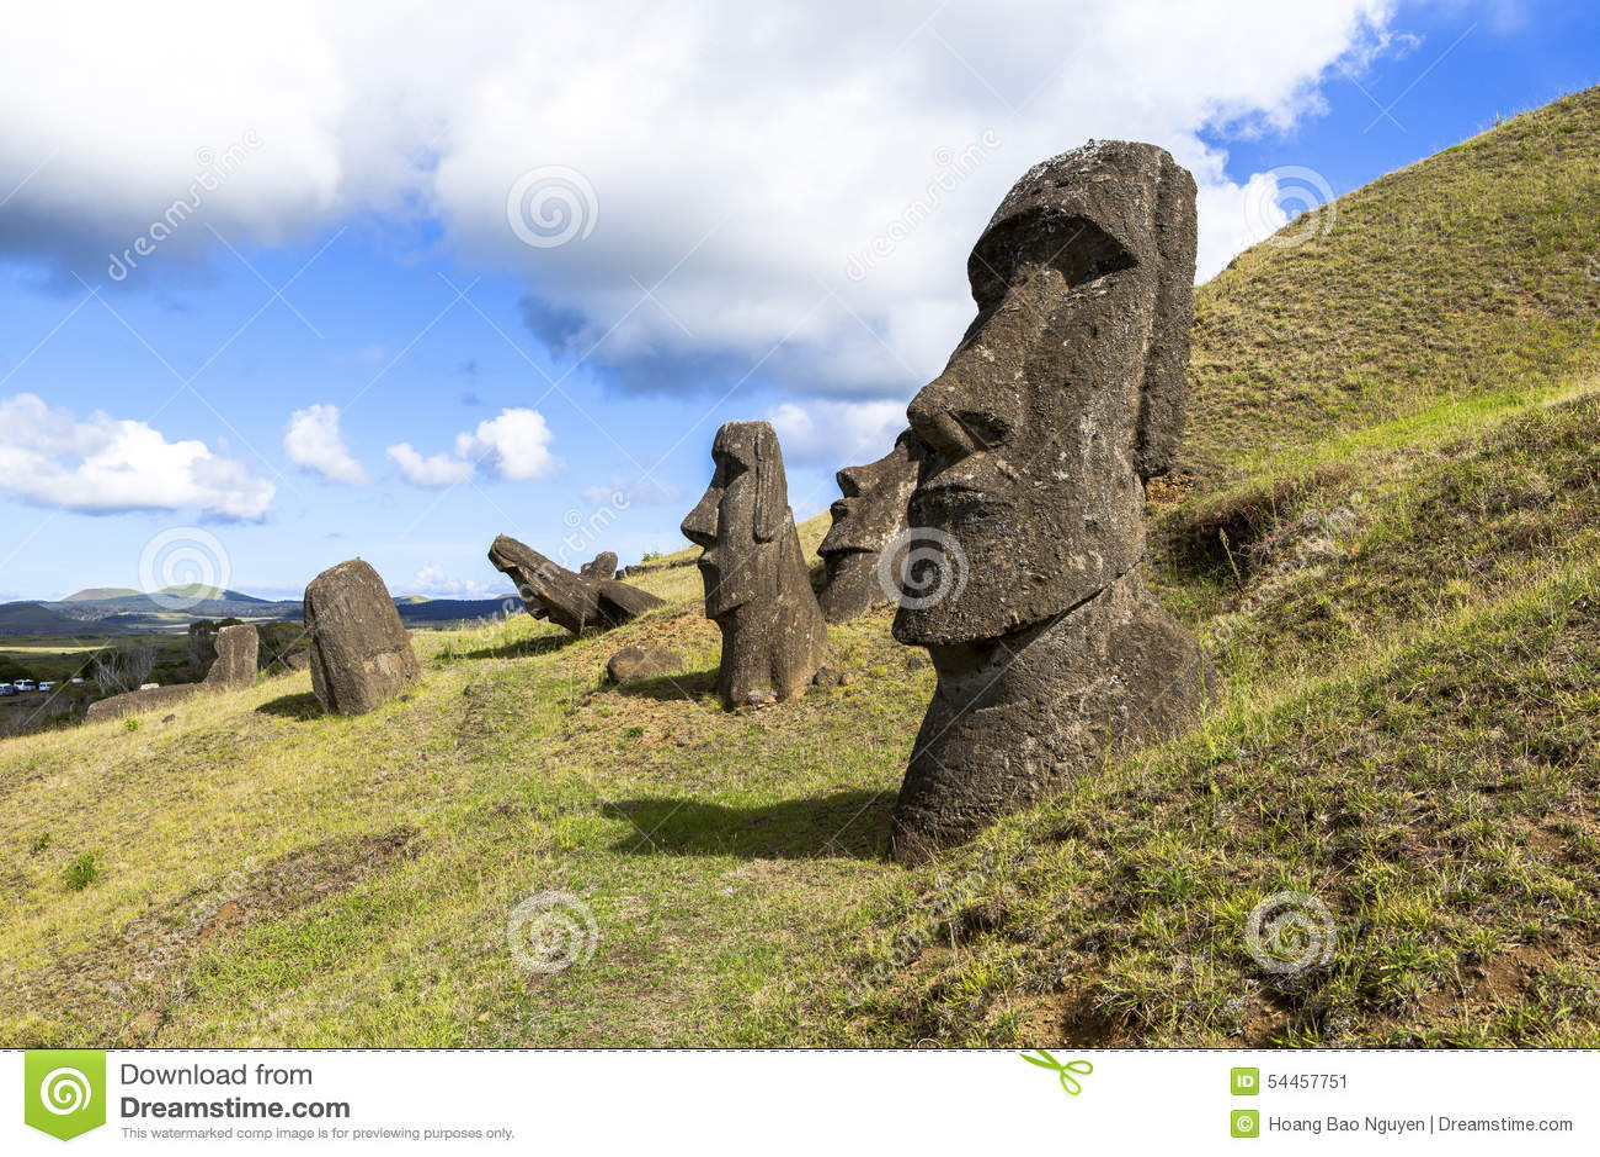 Moai Statues in Easter Island, Chile